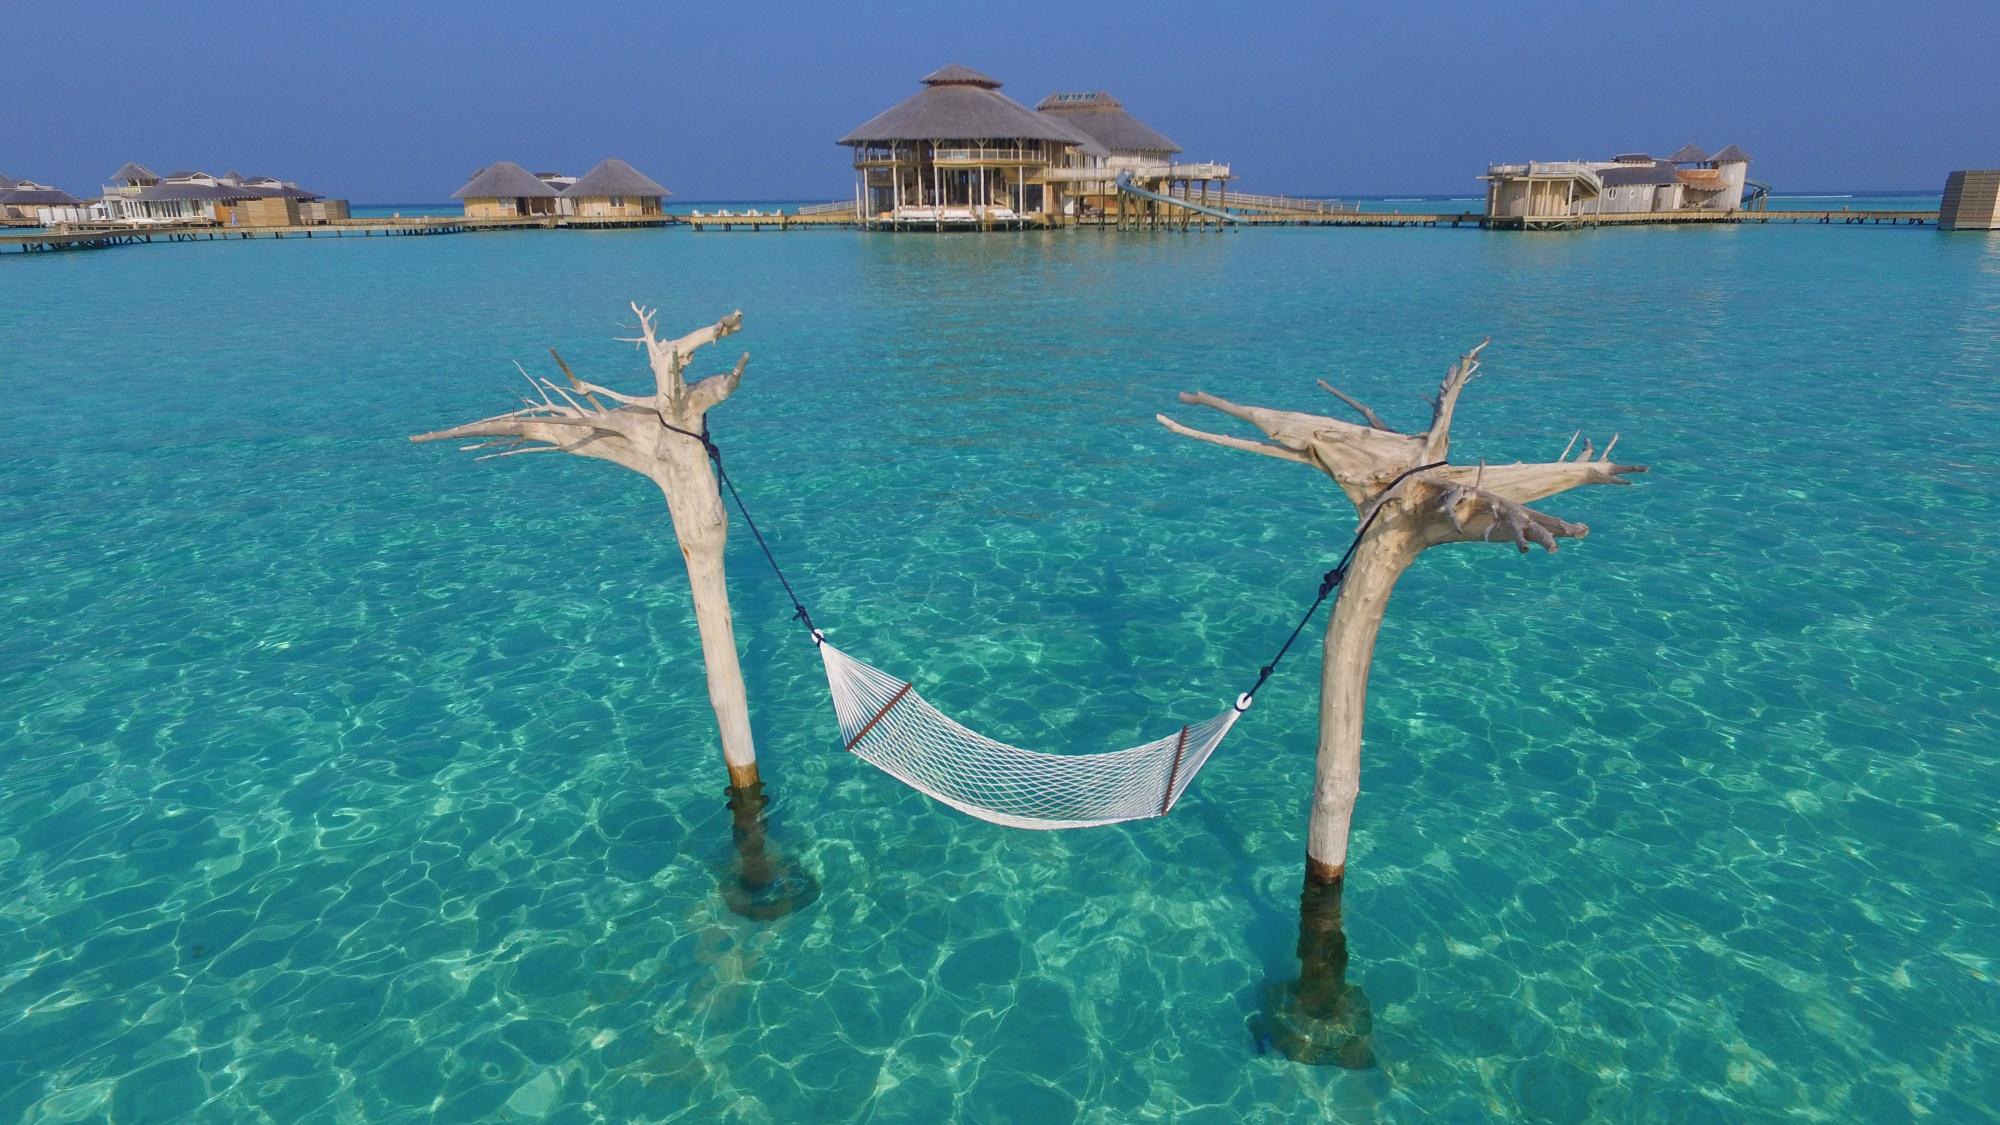 Soneva Jani Maldives Instagram Famous Water Villas With